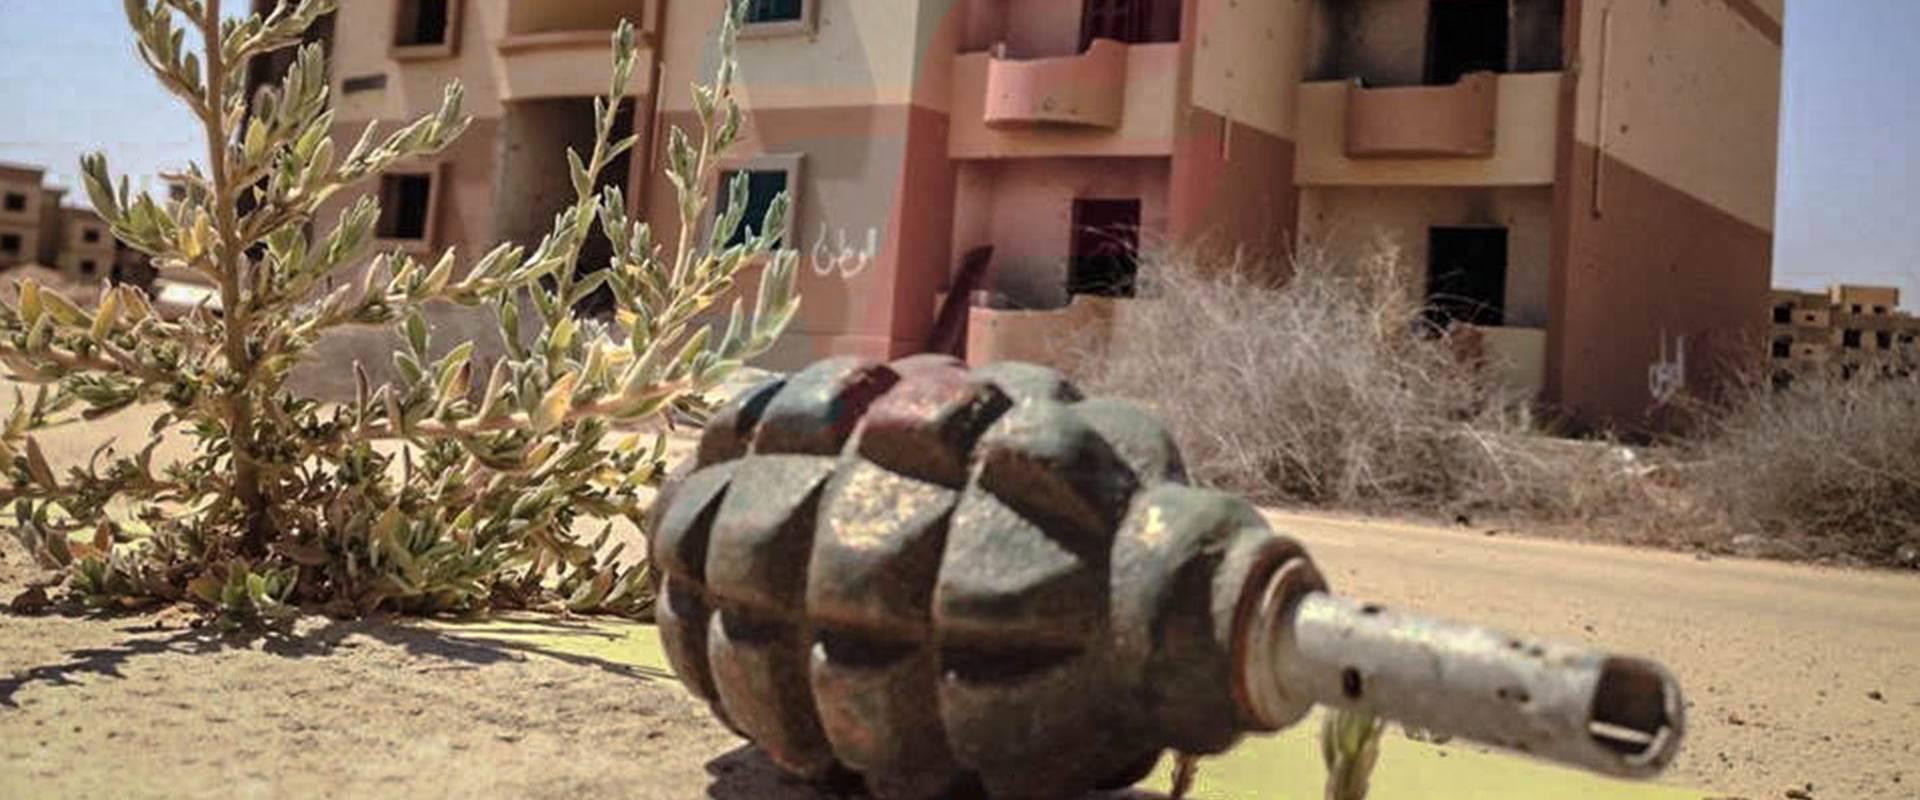 Minenräumung in Libyen